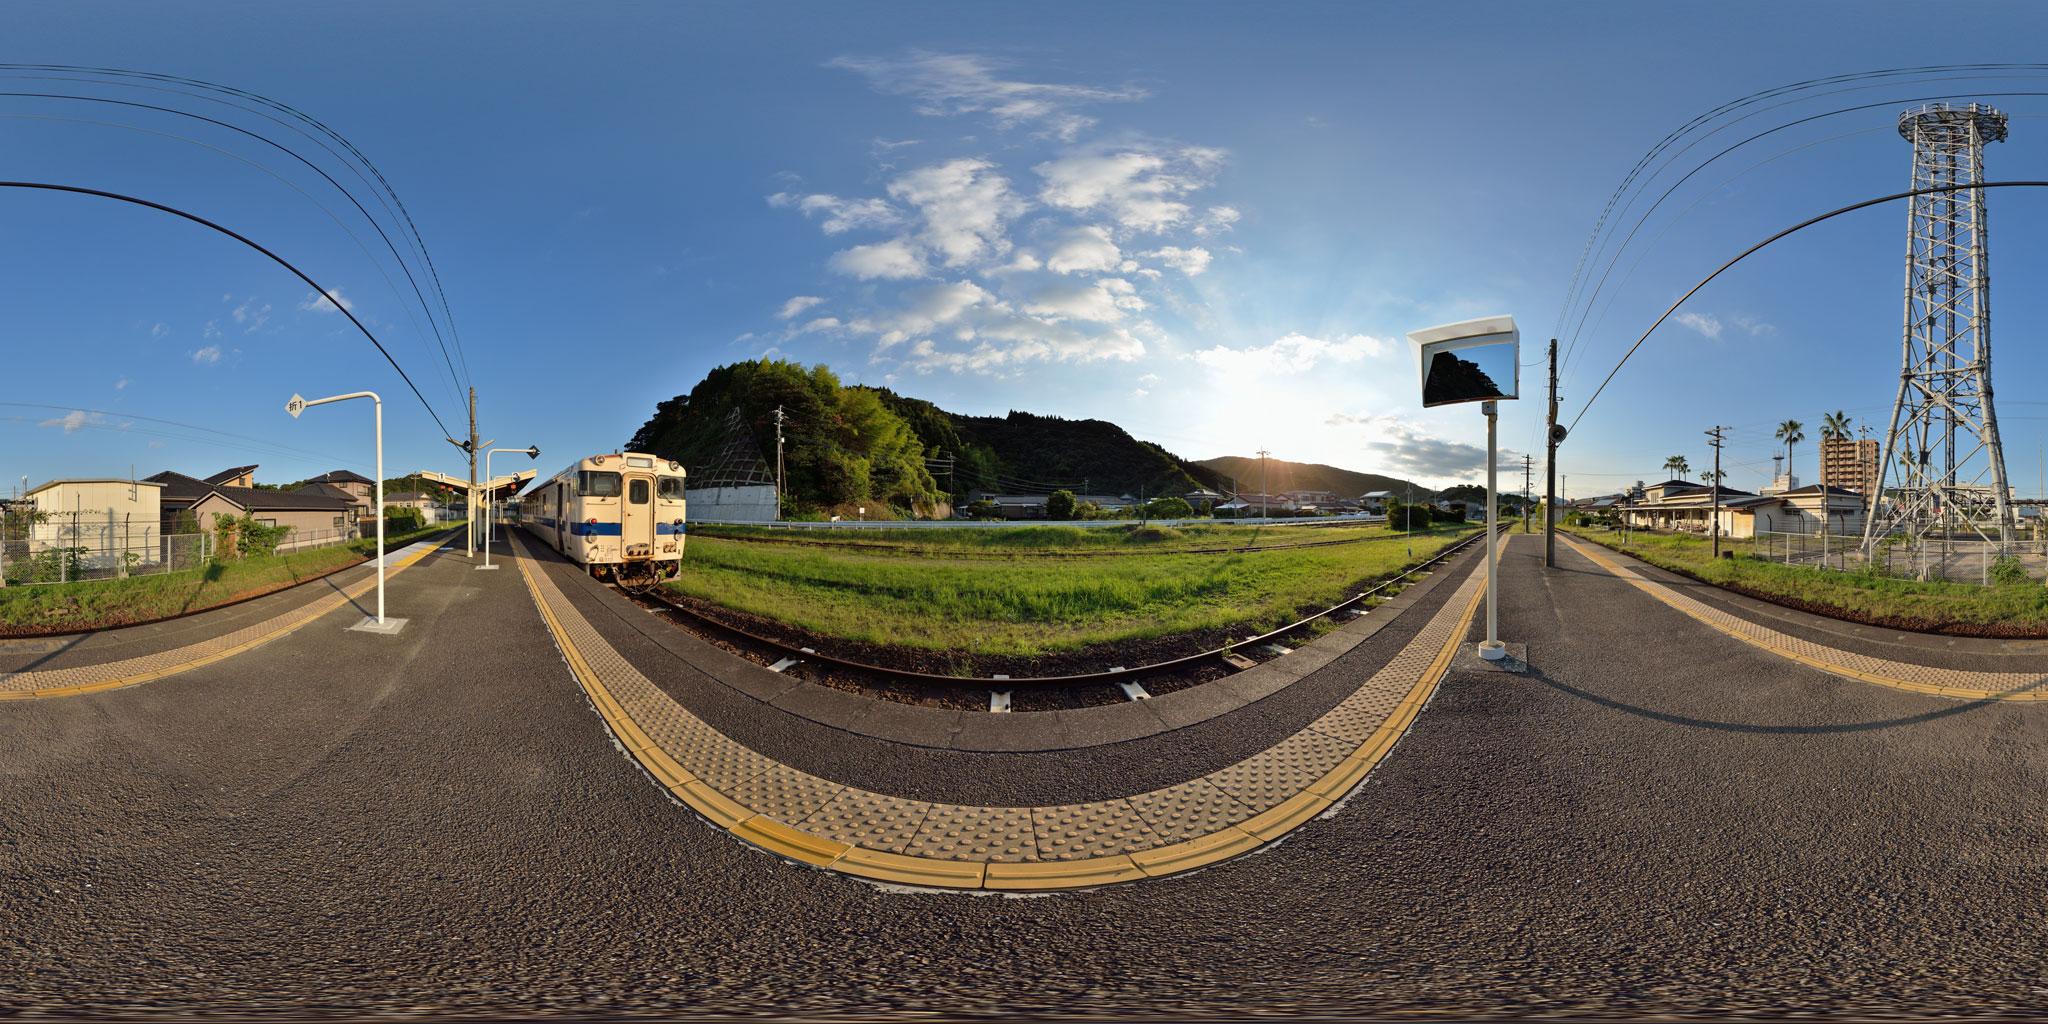 日南線油津駅、台風一過の夕焼け空